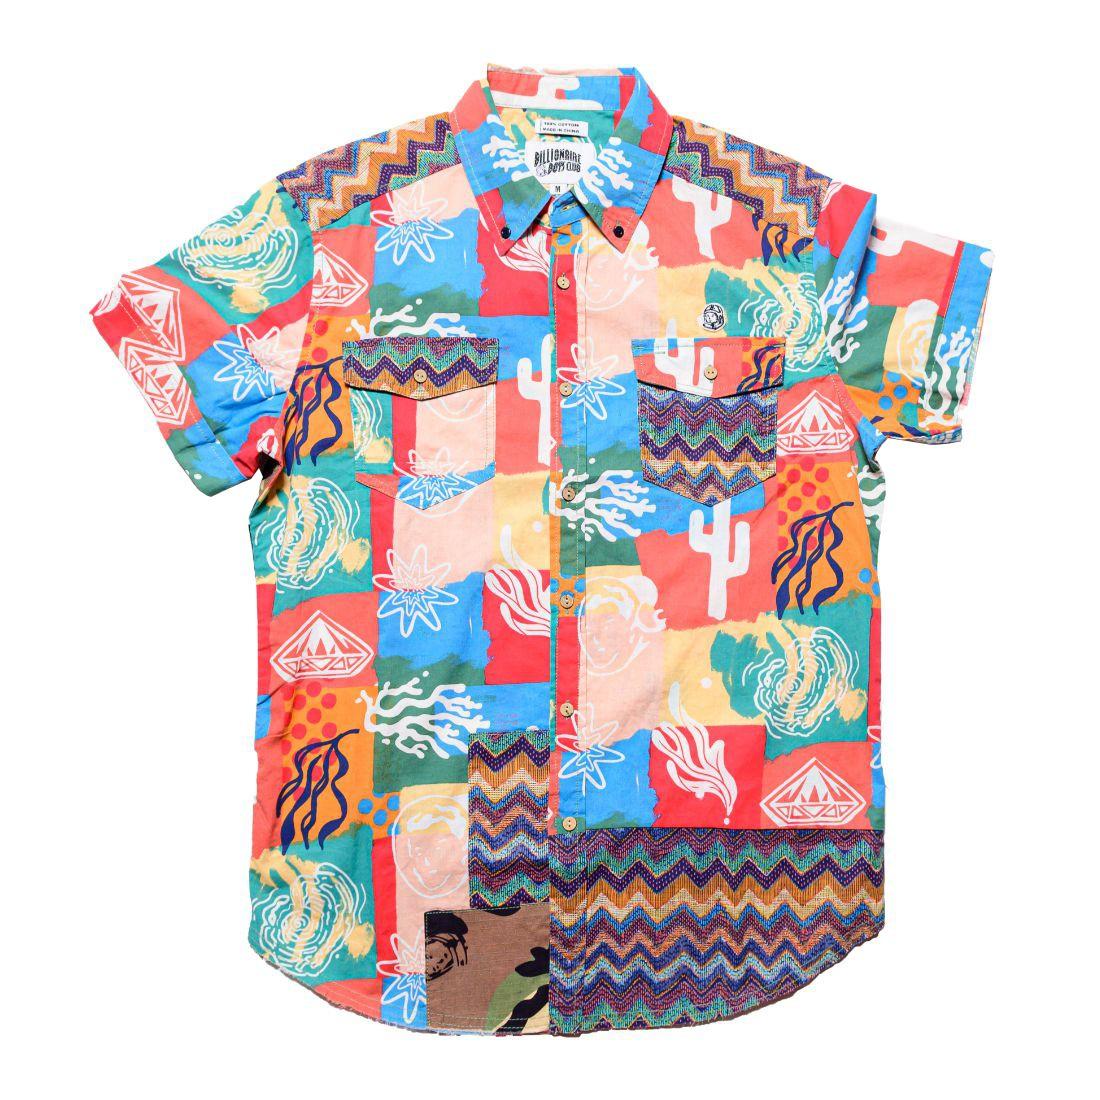 Billionaire Boys Club Men Axis Woven Short Sleeve Shirt (pink / deep sea coral)